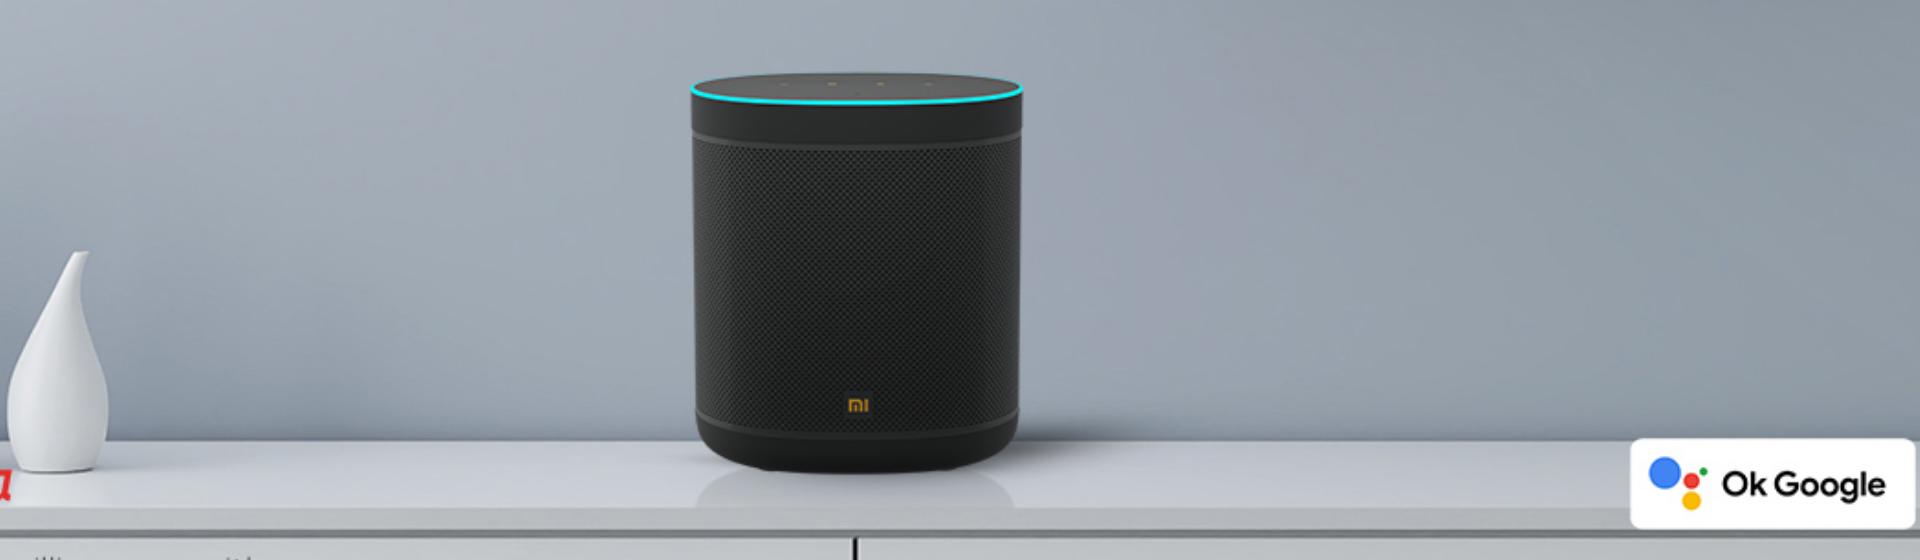 Mi Smart Speaker, da Xiaomi, é a nova aposta de smart speaker no Brasil